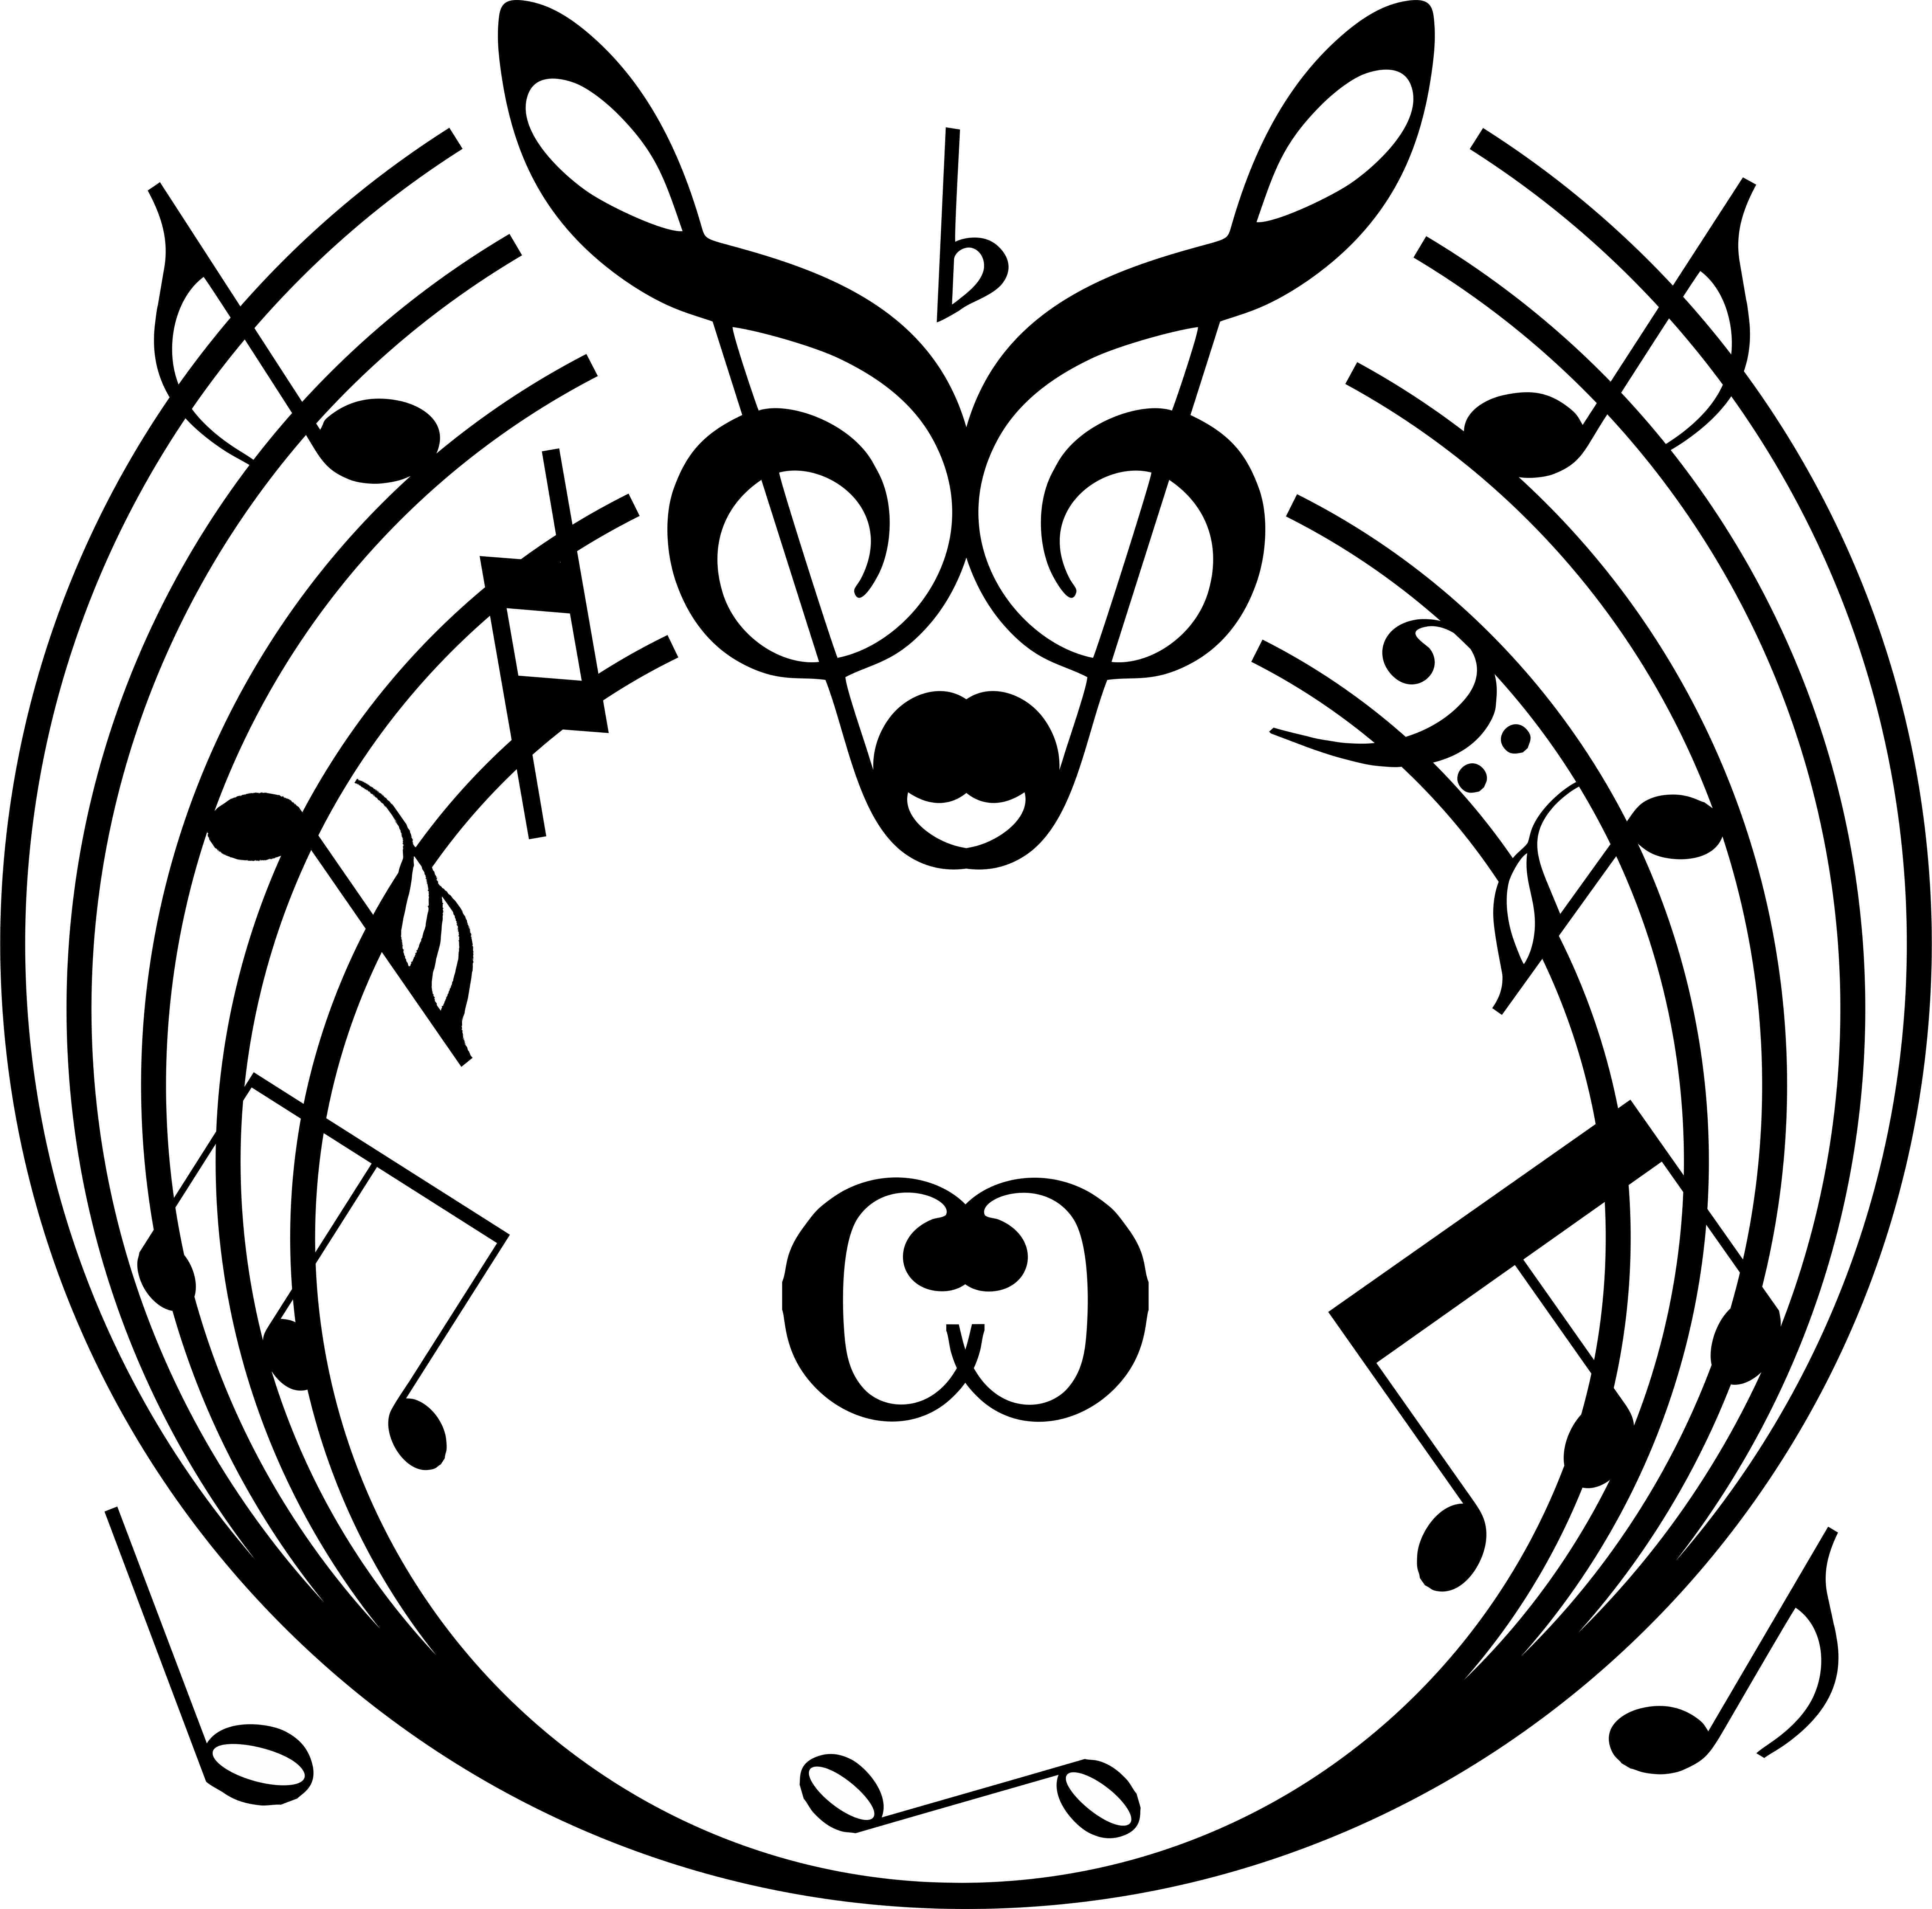 Musical Notes & Score  Round Circular  Wall Vinyl